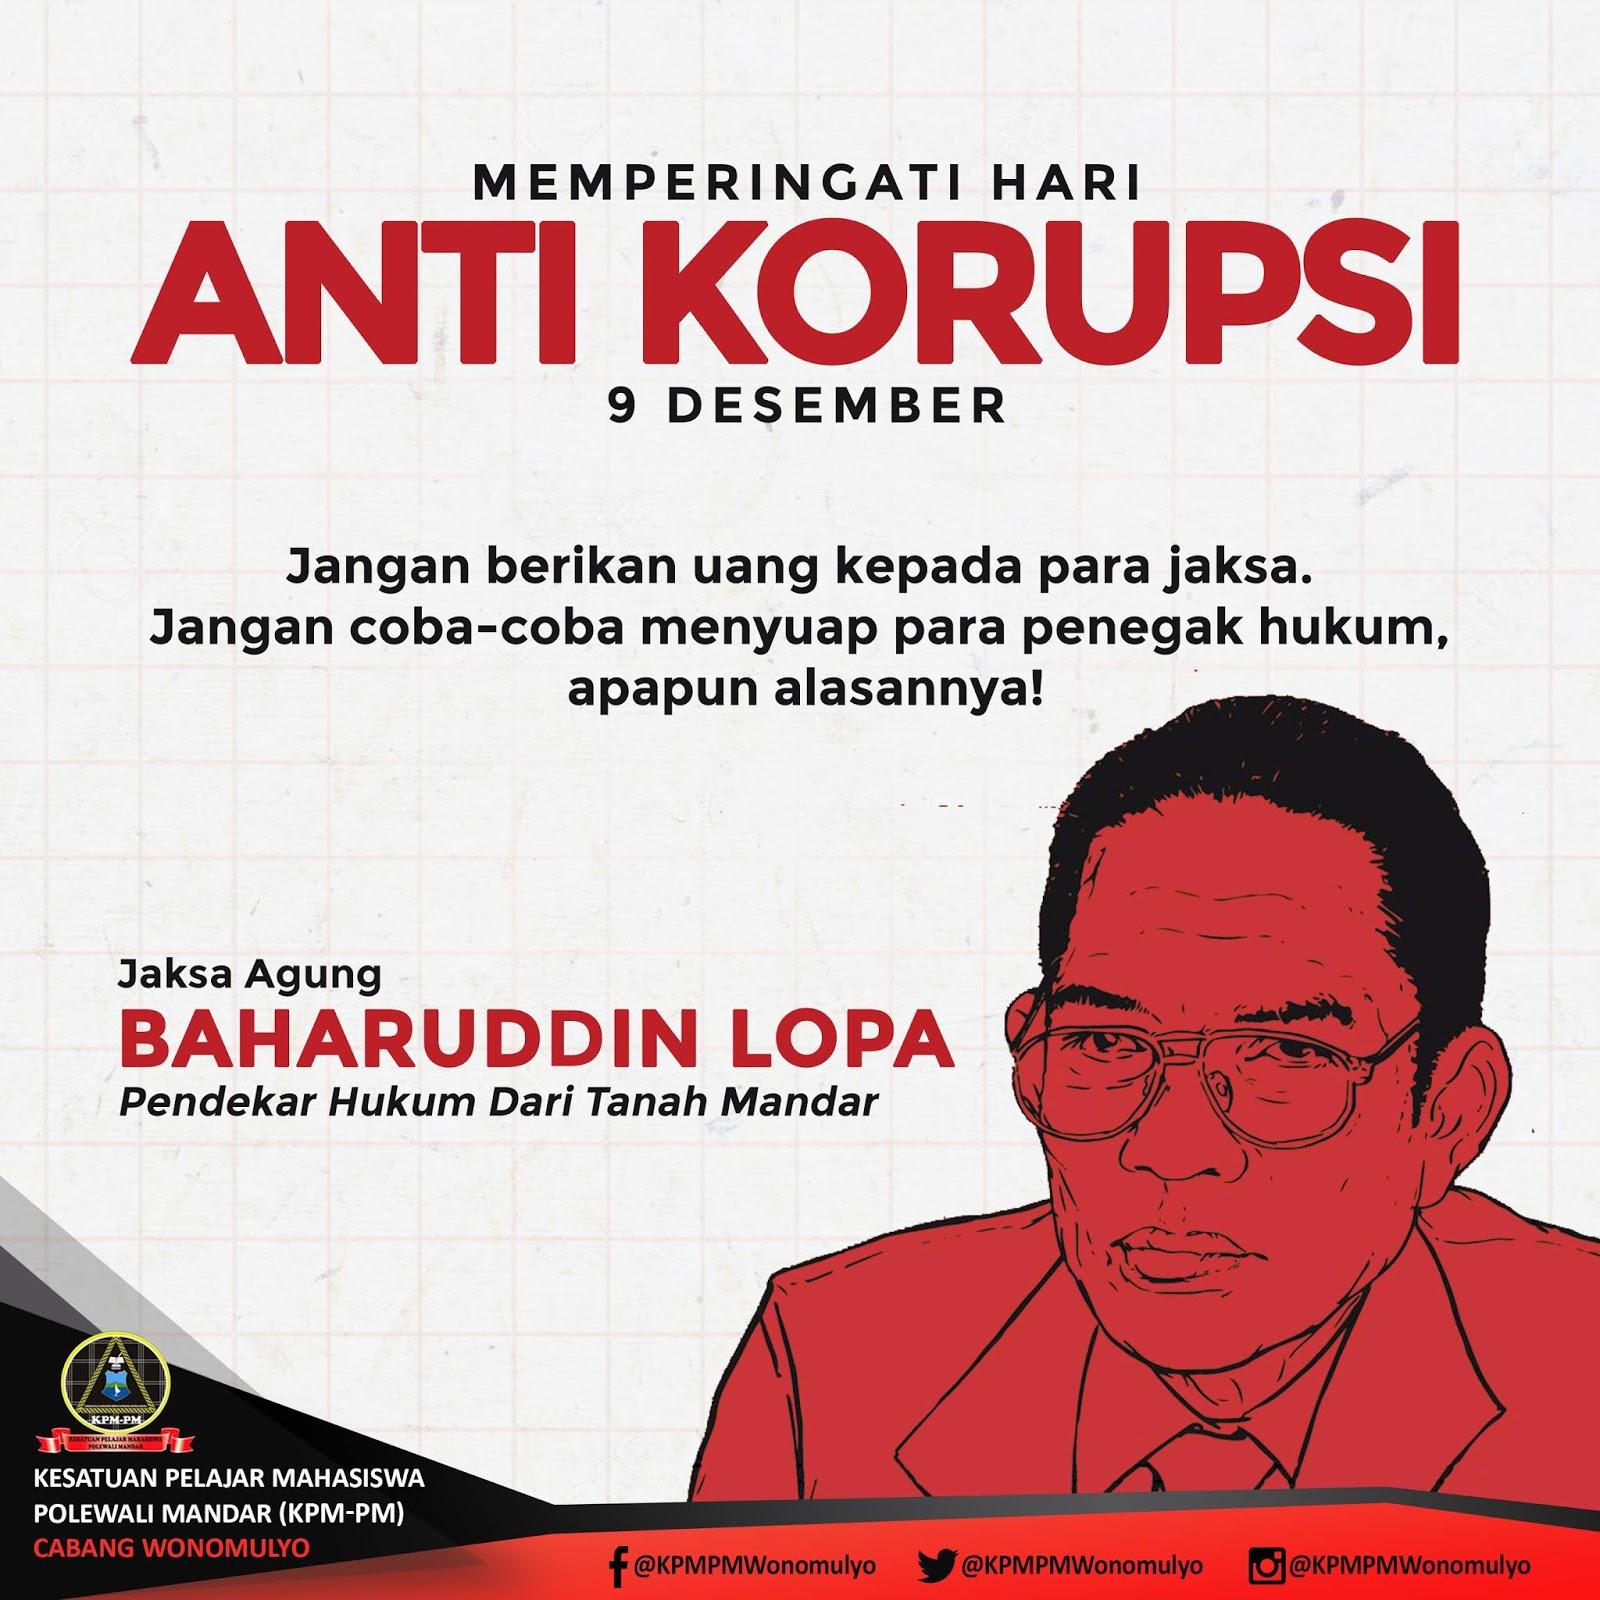 Baharudin Lopa Jaksa Agung Hari Anti Korupsi Kisah Jaksa Agung Baharuddin Lopa Pendekar Hukum Dari Tanah Mandar Kpm Pm Cabang Wonomulyo